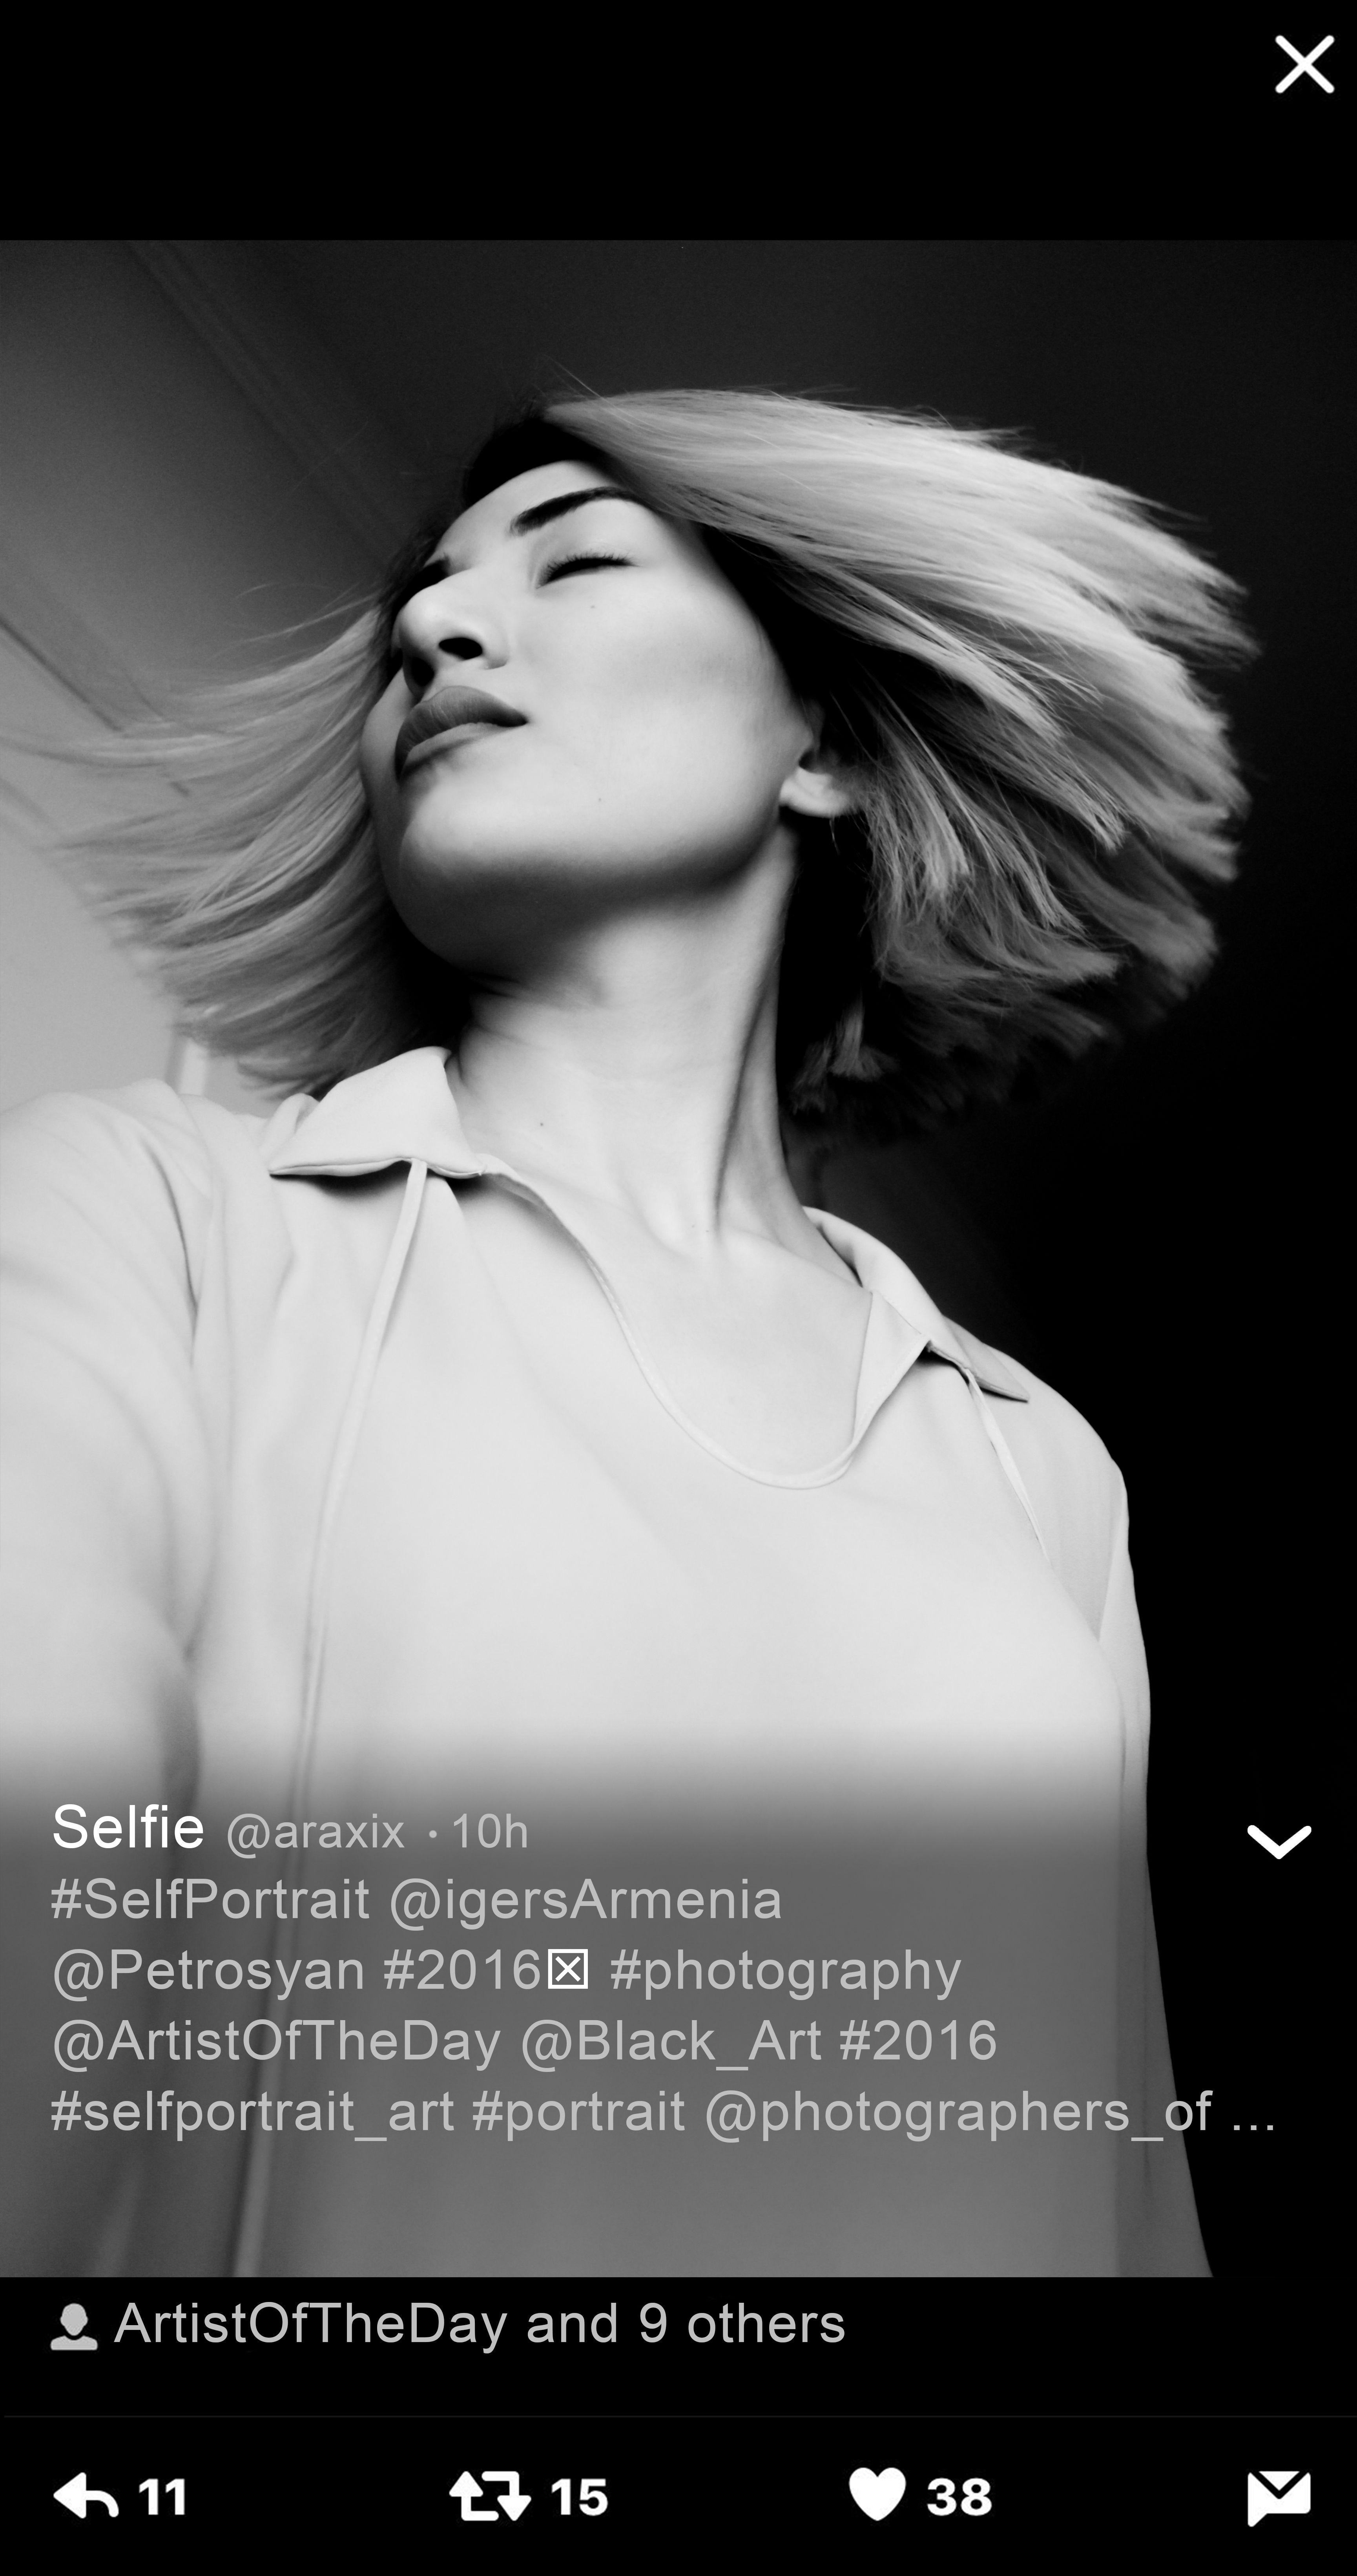 Self portrait fashion portraiture white hair girl art photography black and white monochrome by artist